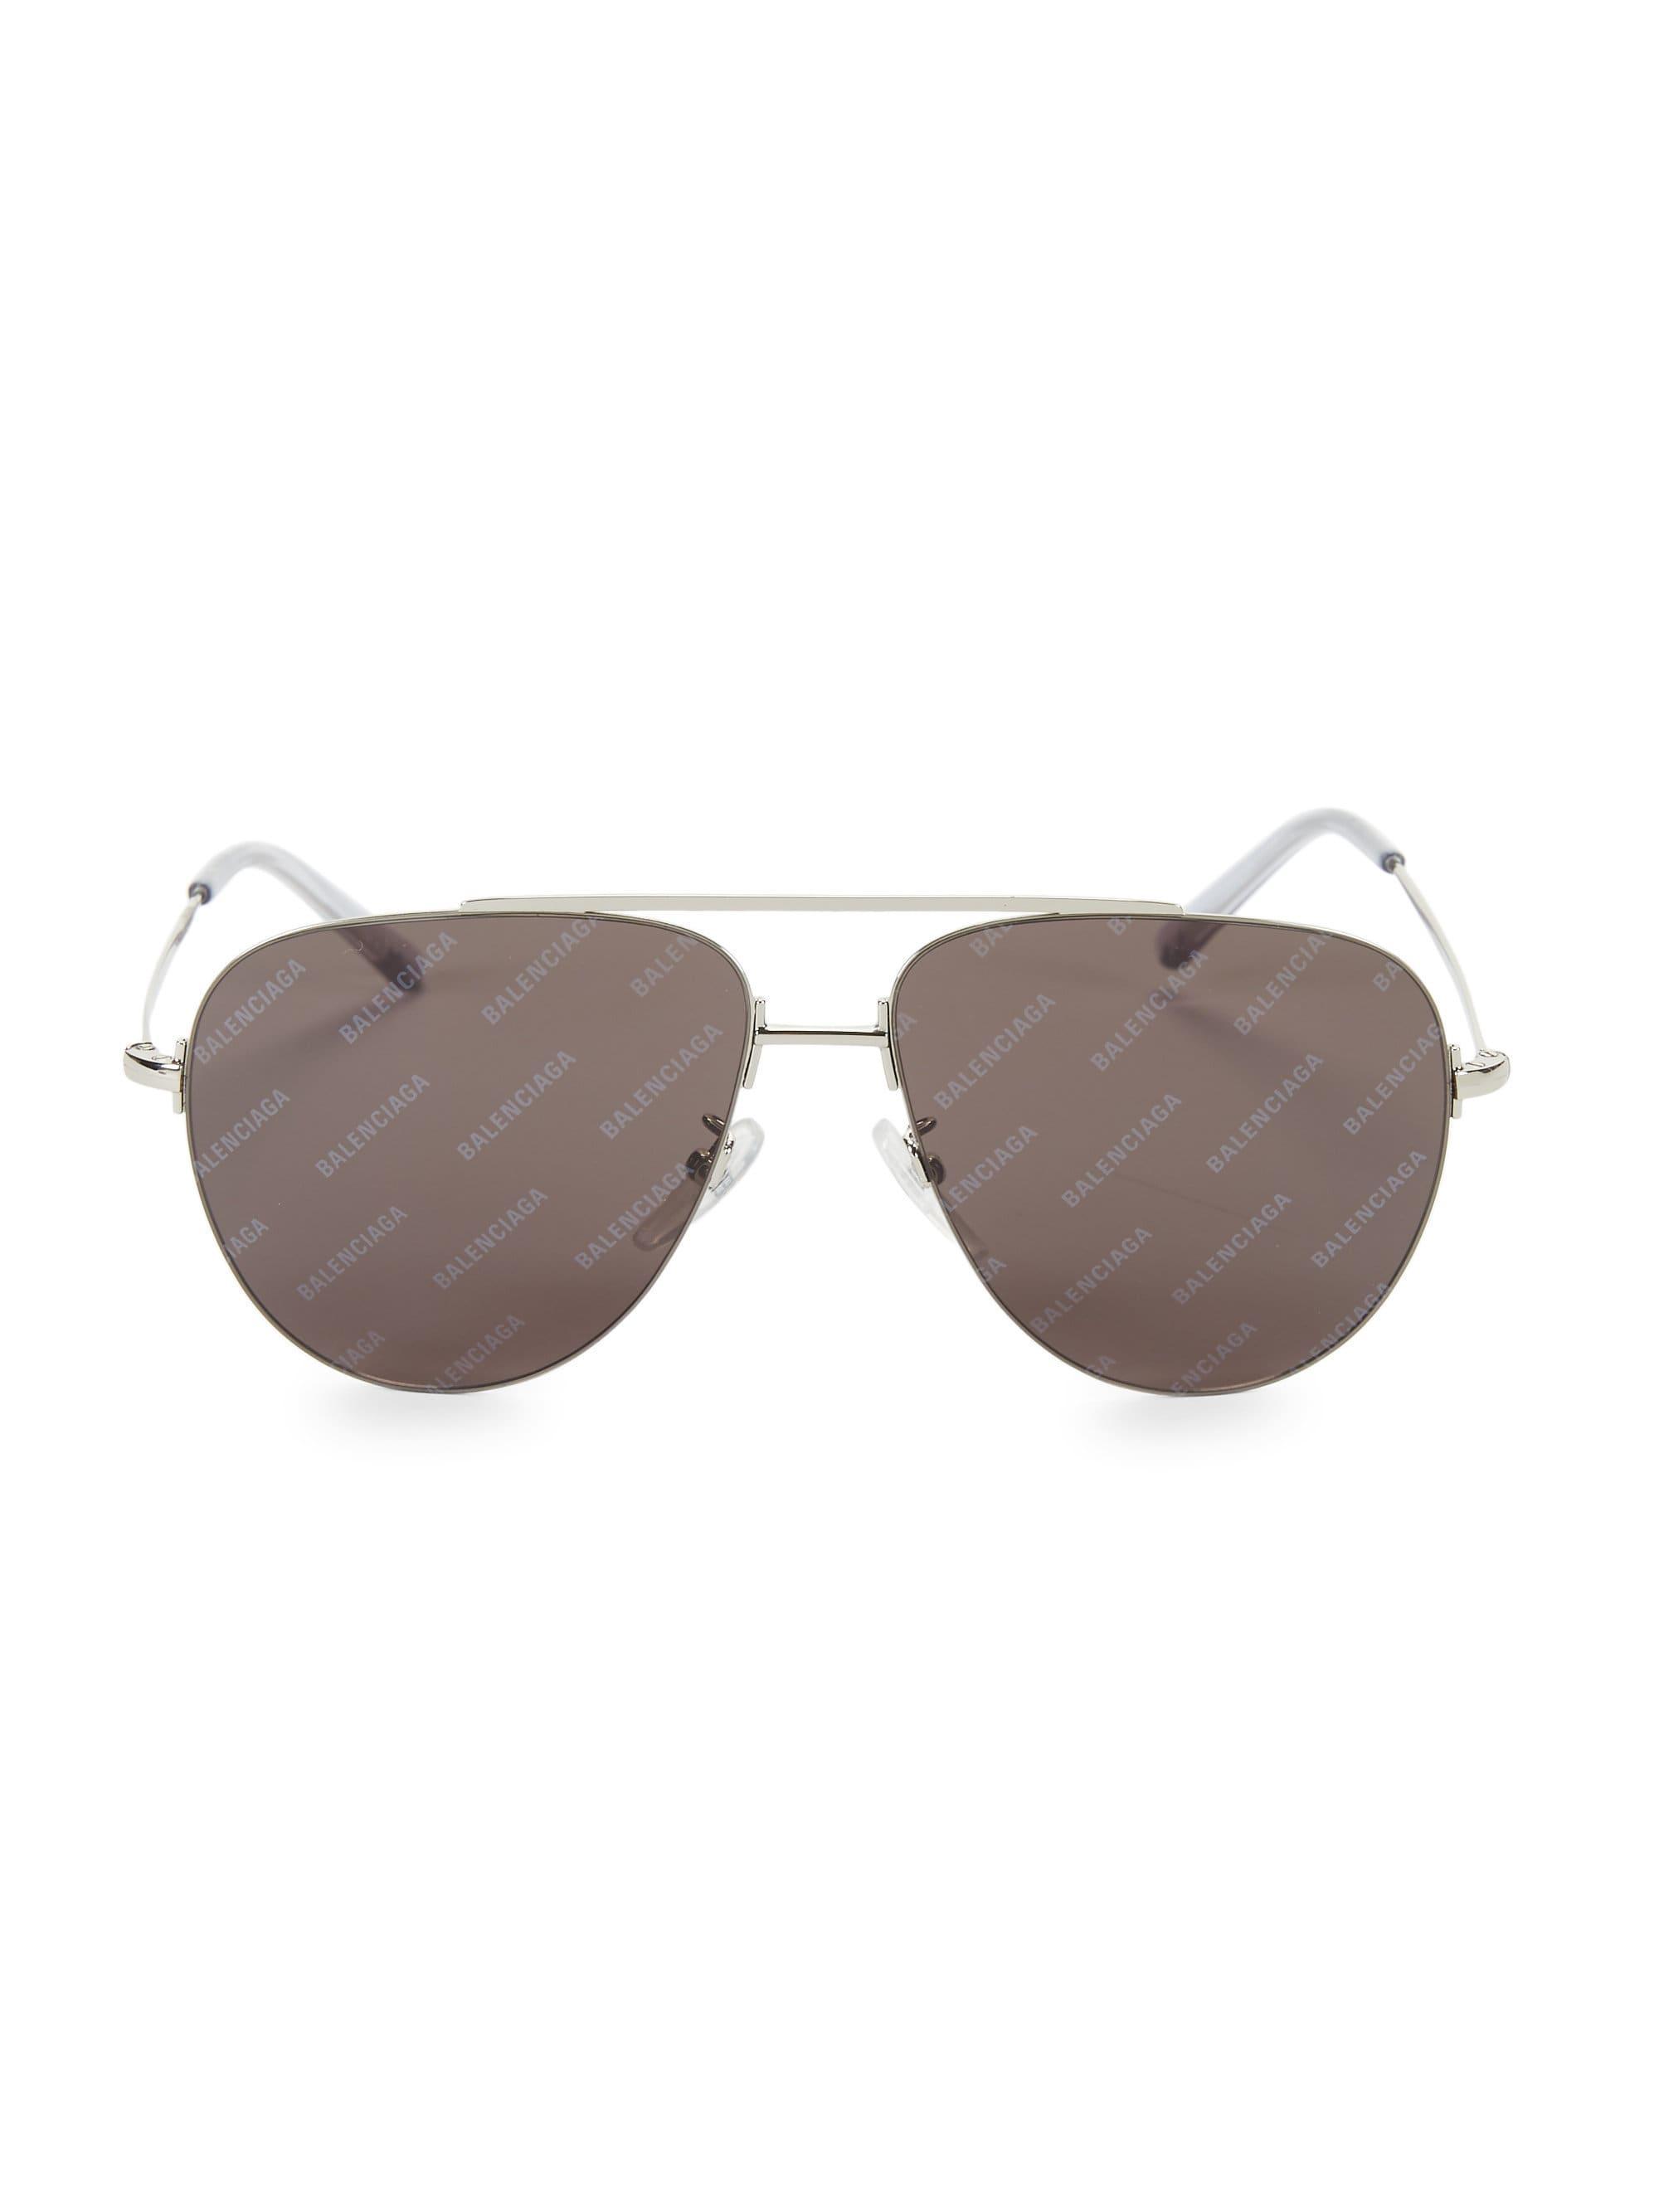 d6a9d9865fcf Balenciaga - Metallic Men's 59mm Unisex Classic Aviator Sunglasses - Silver  for Men - Lyst. View fullscreen